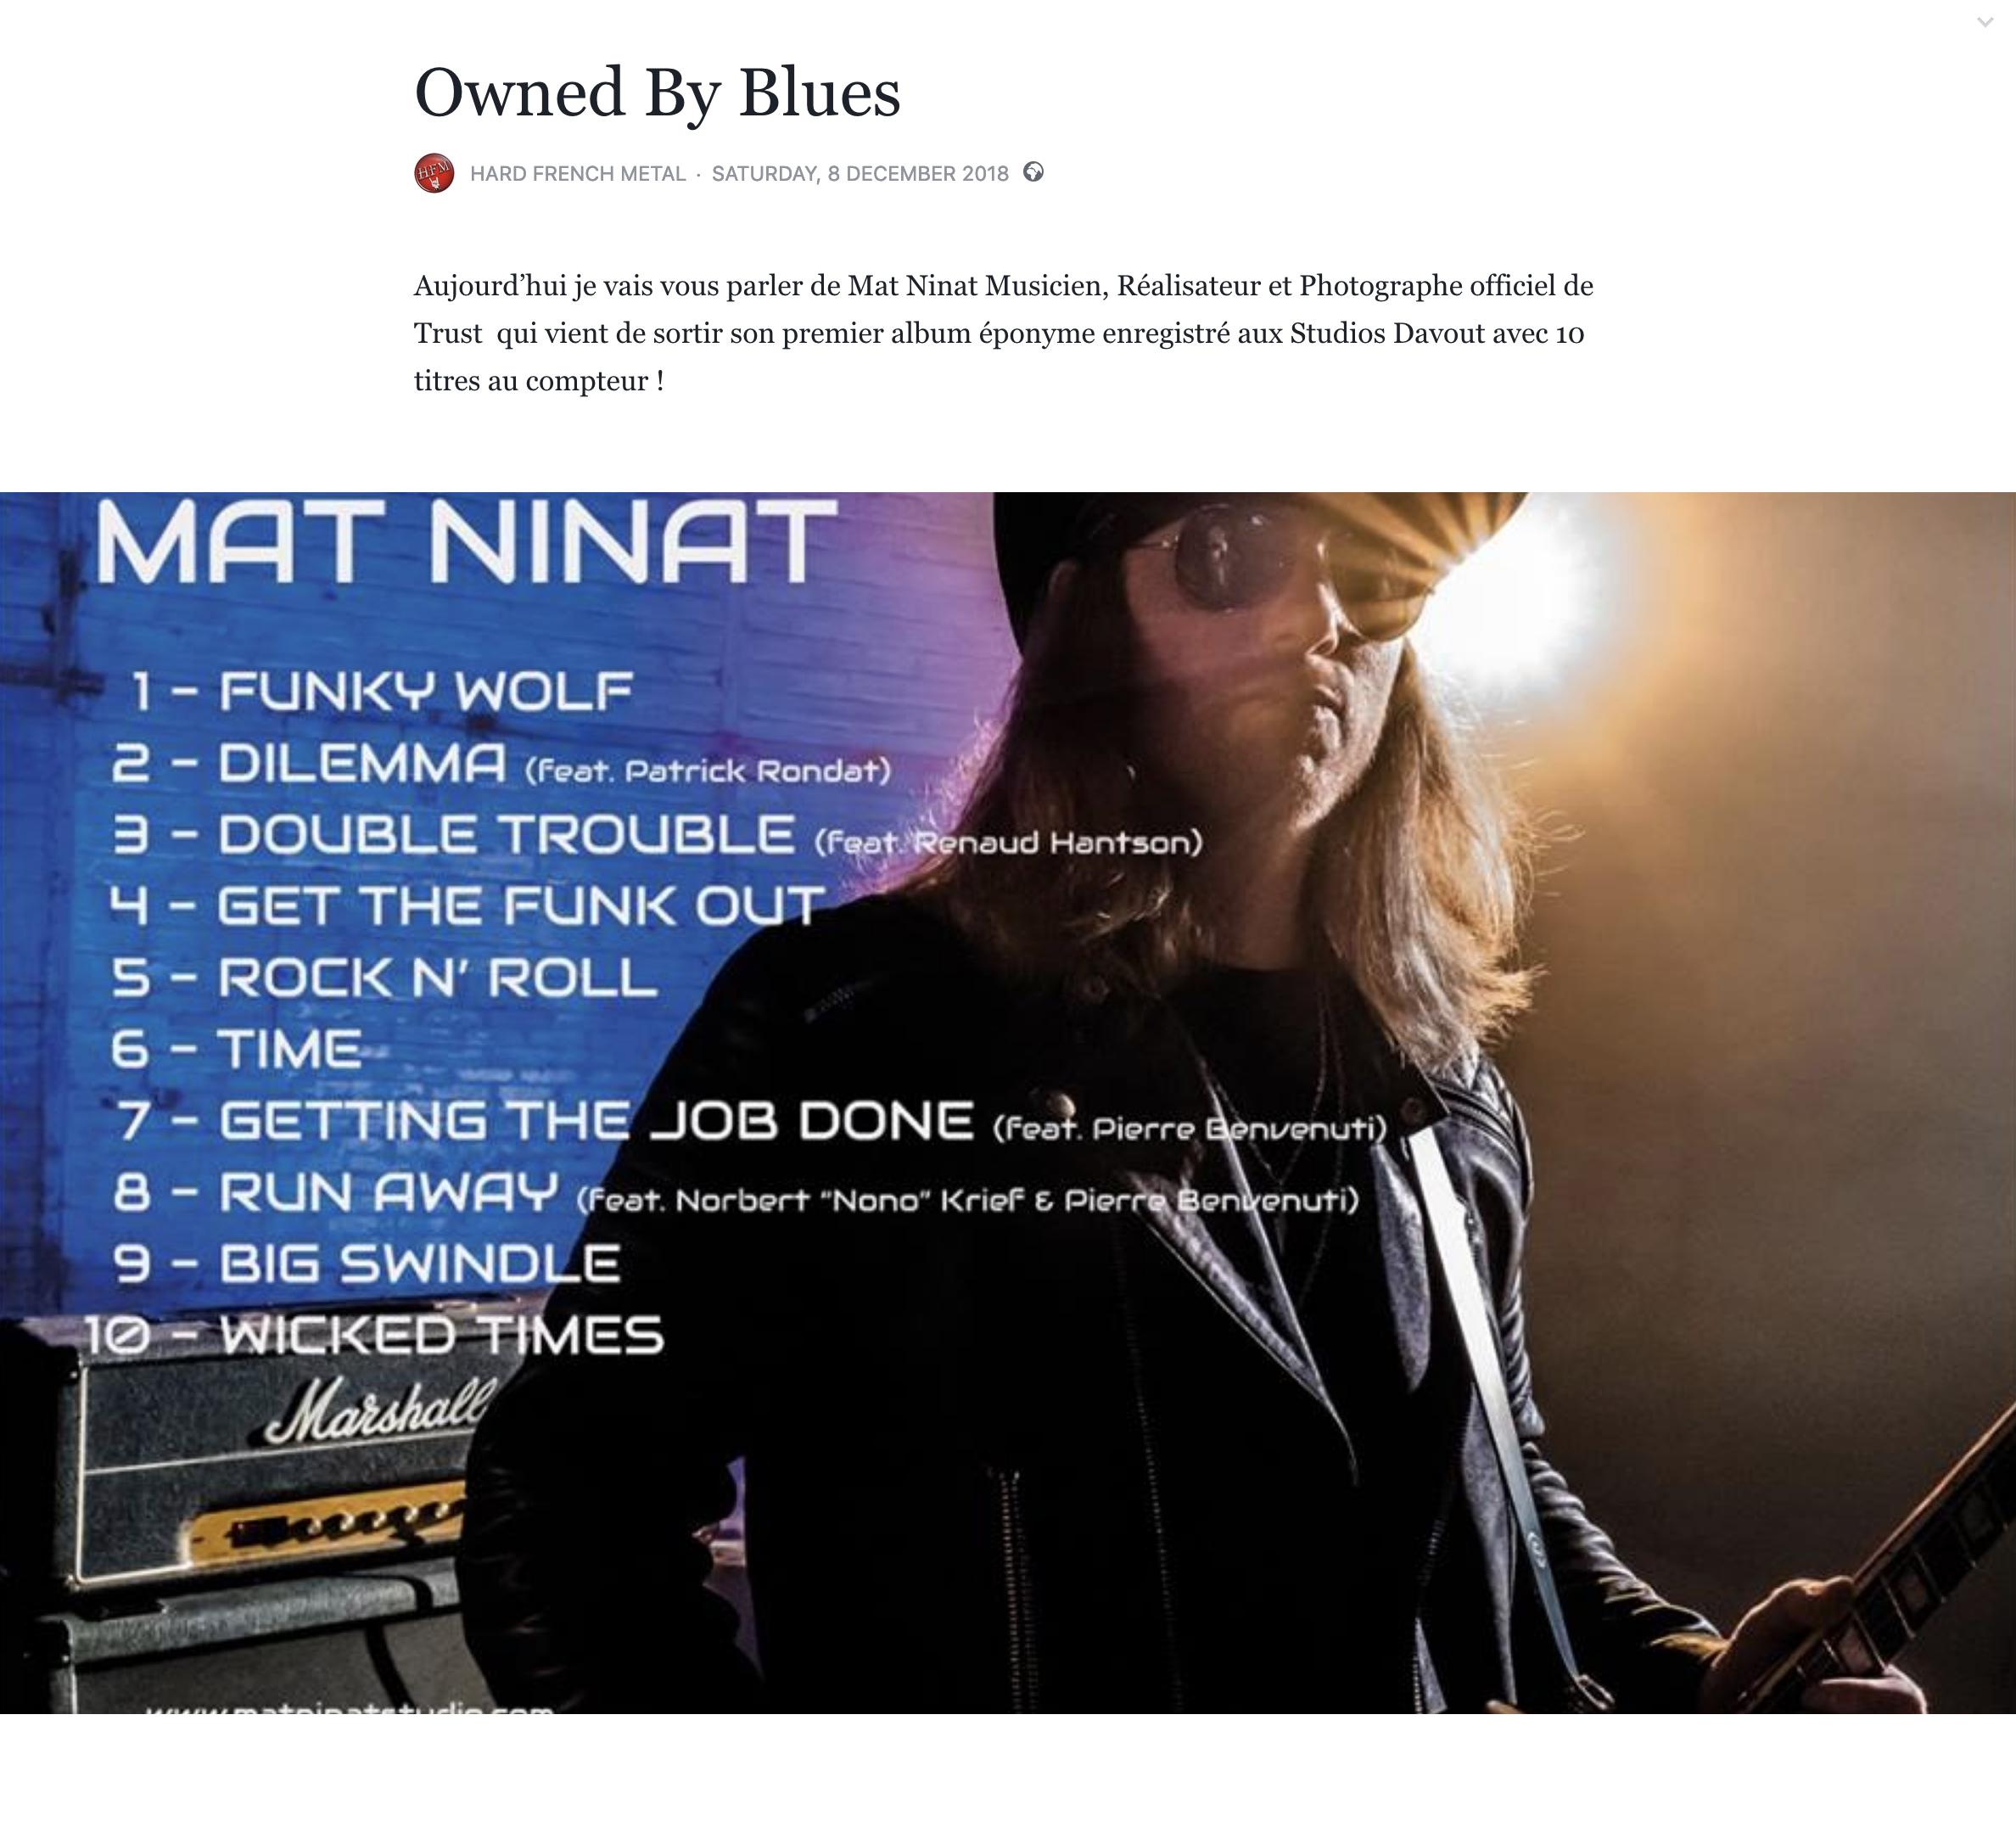 MAT NINAT HARD FRENCH METAL